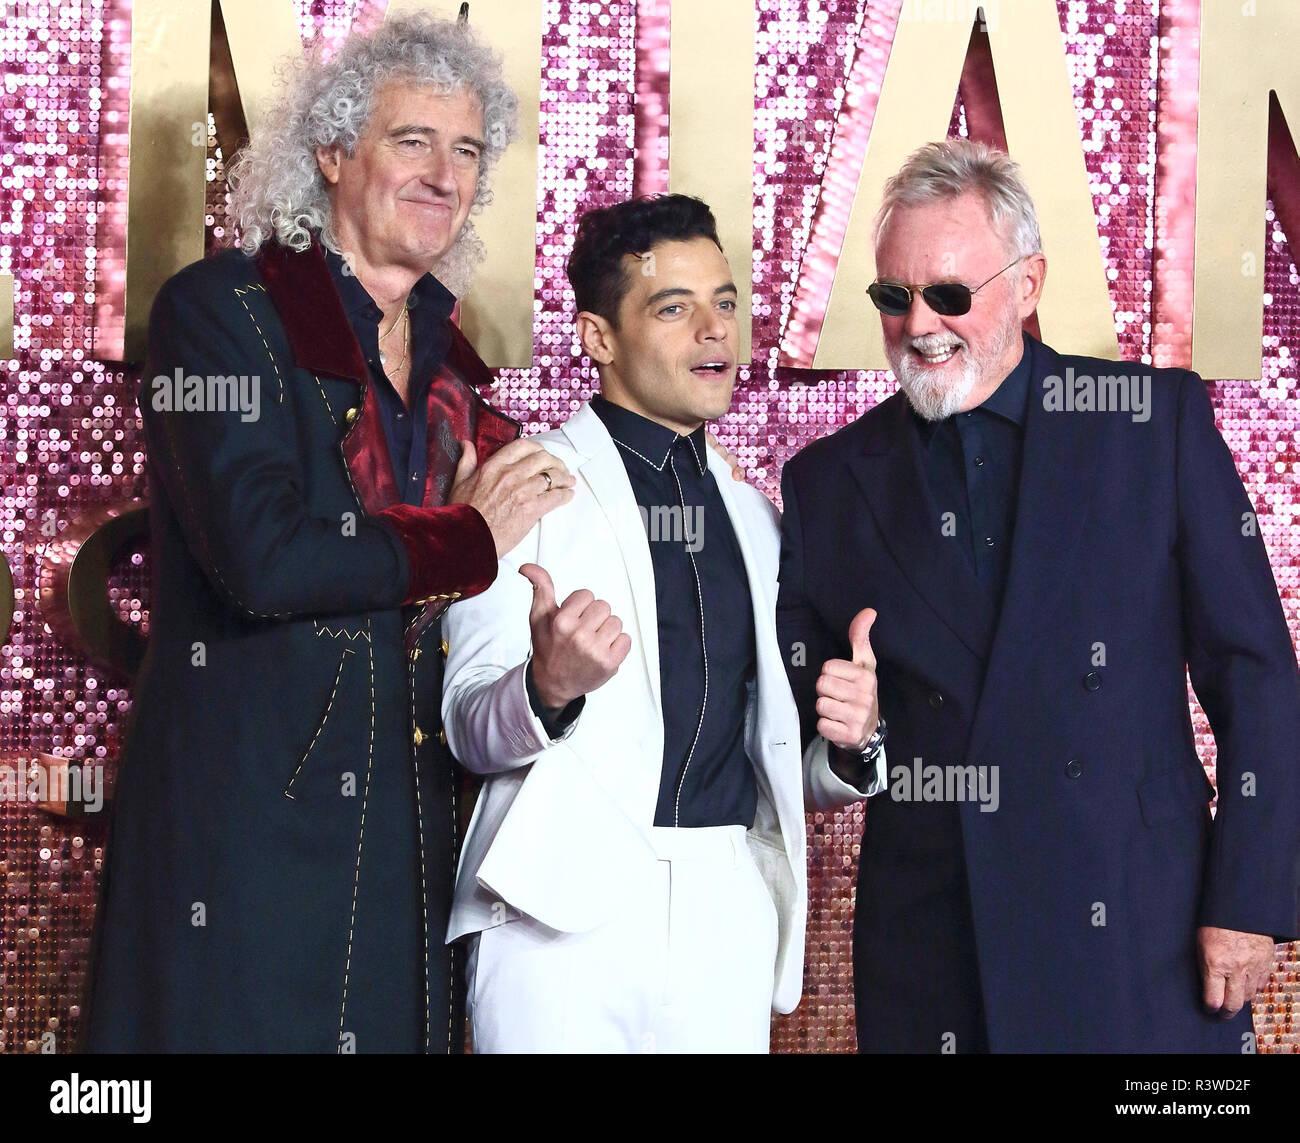 Bohemian Rhapsody UK Premiere al SSE Wembley Arena, Londra dotata: Brian May, Rami Malek, Roger Taylor dove: Londra, Regno Unito quando: 23 Ott 2018 Credit: WENN.com Foto Stock